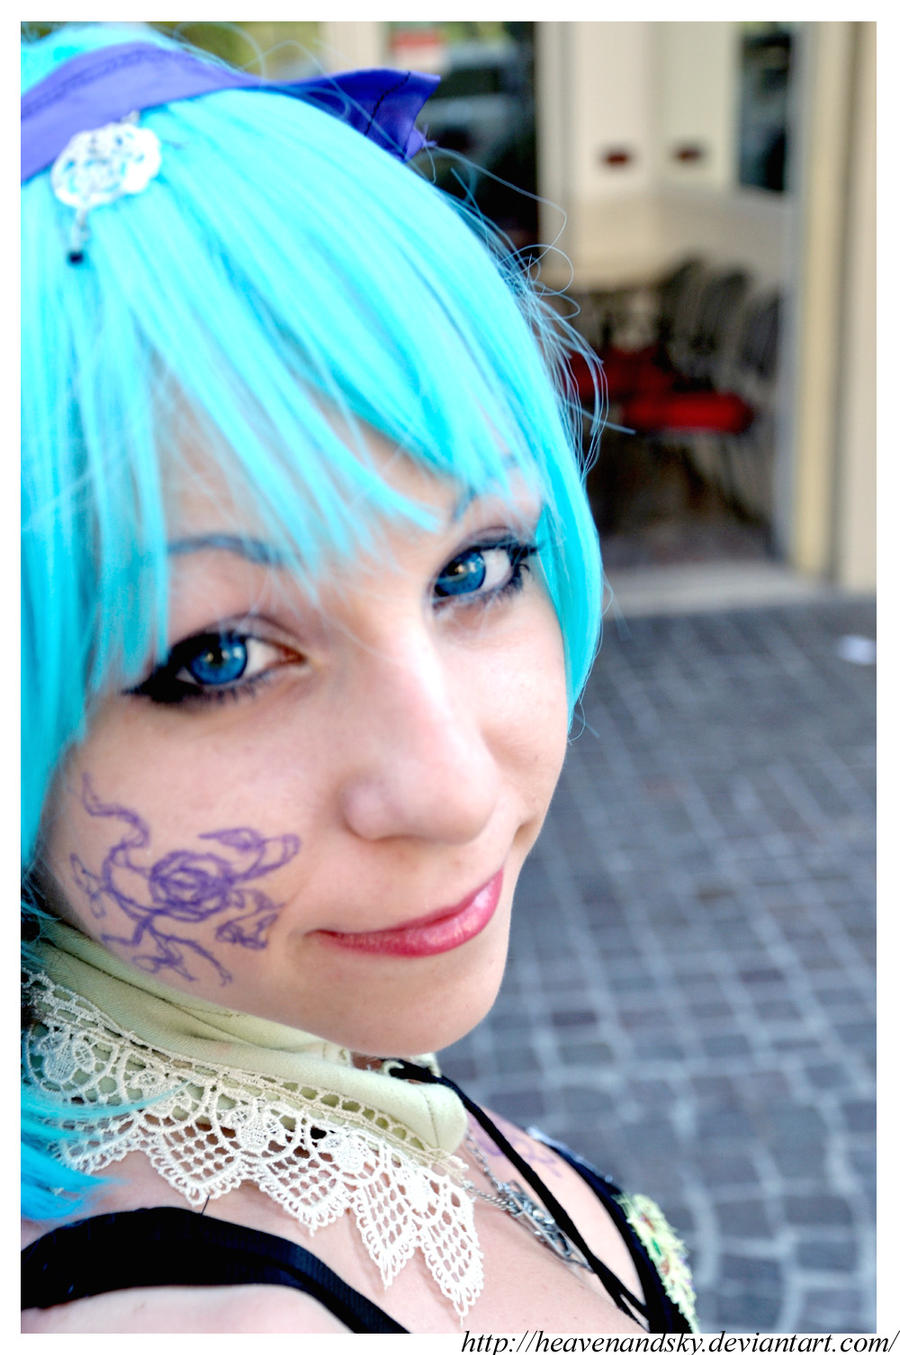 HeavenAndSky's Profile Picture